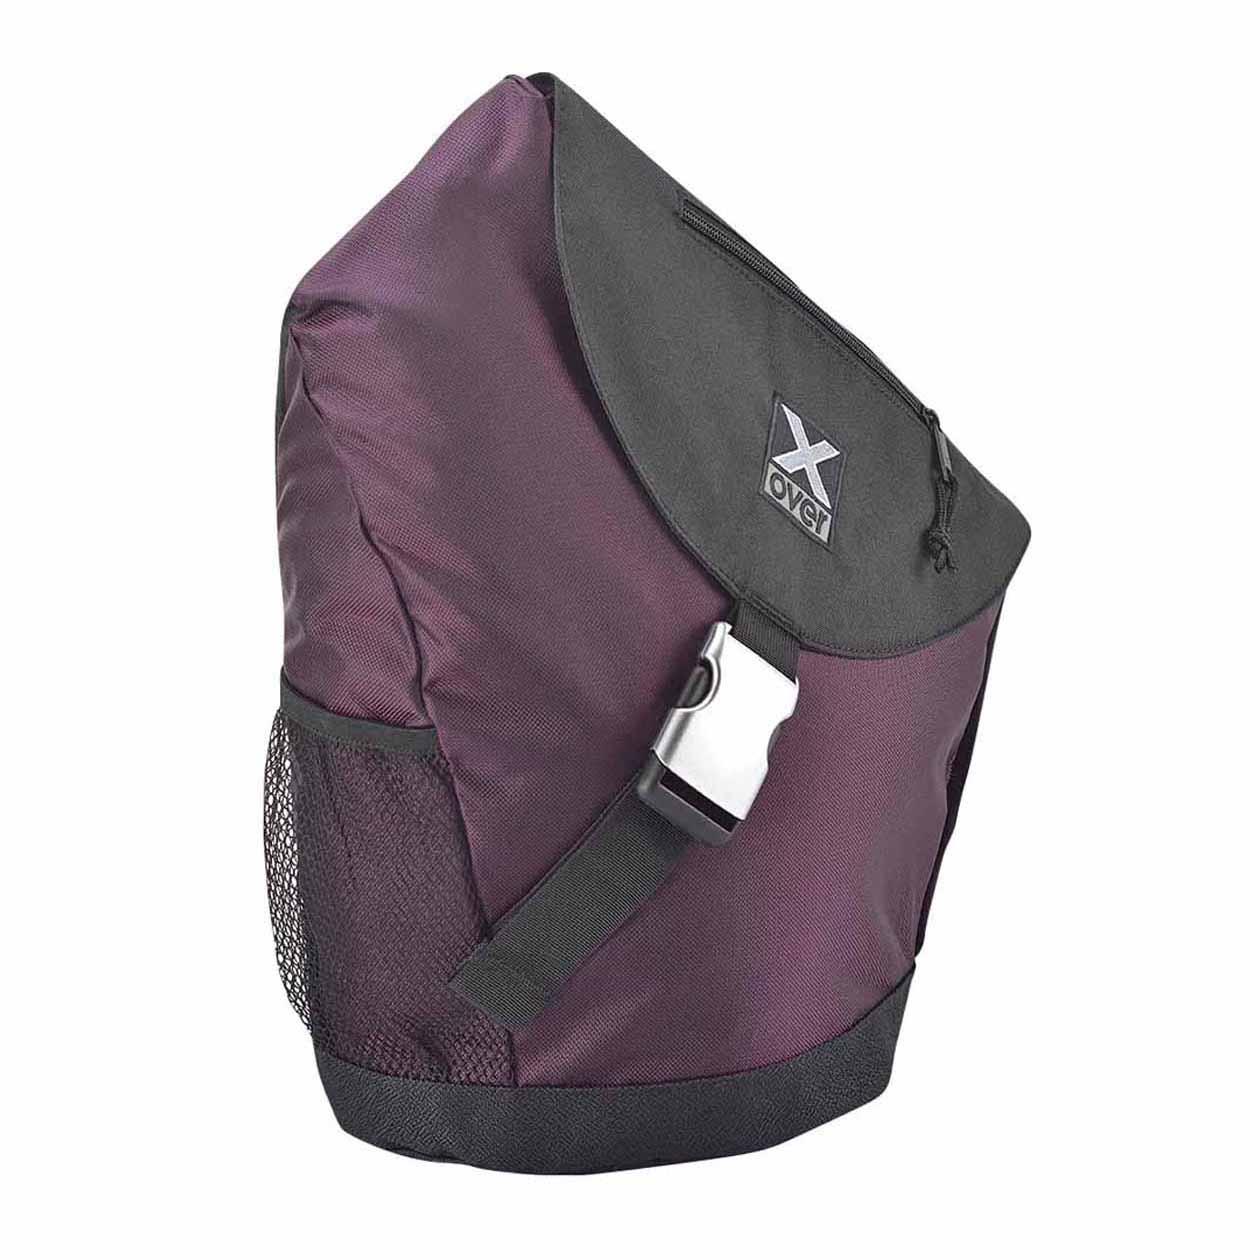 X-Over schuine rugzak original barcelona black purple Large